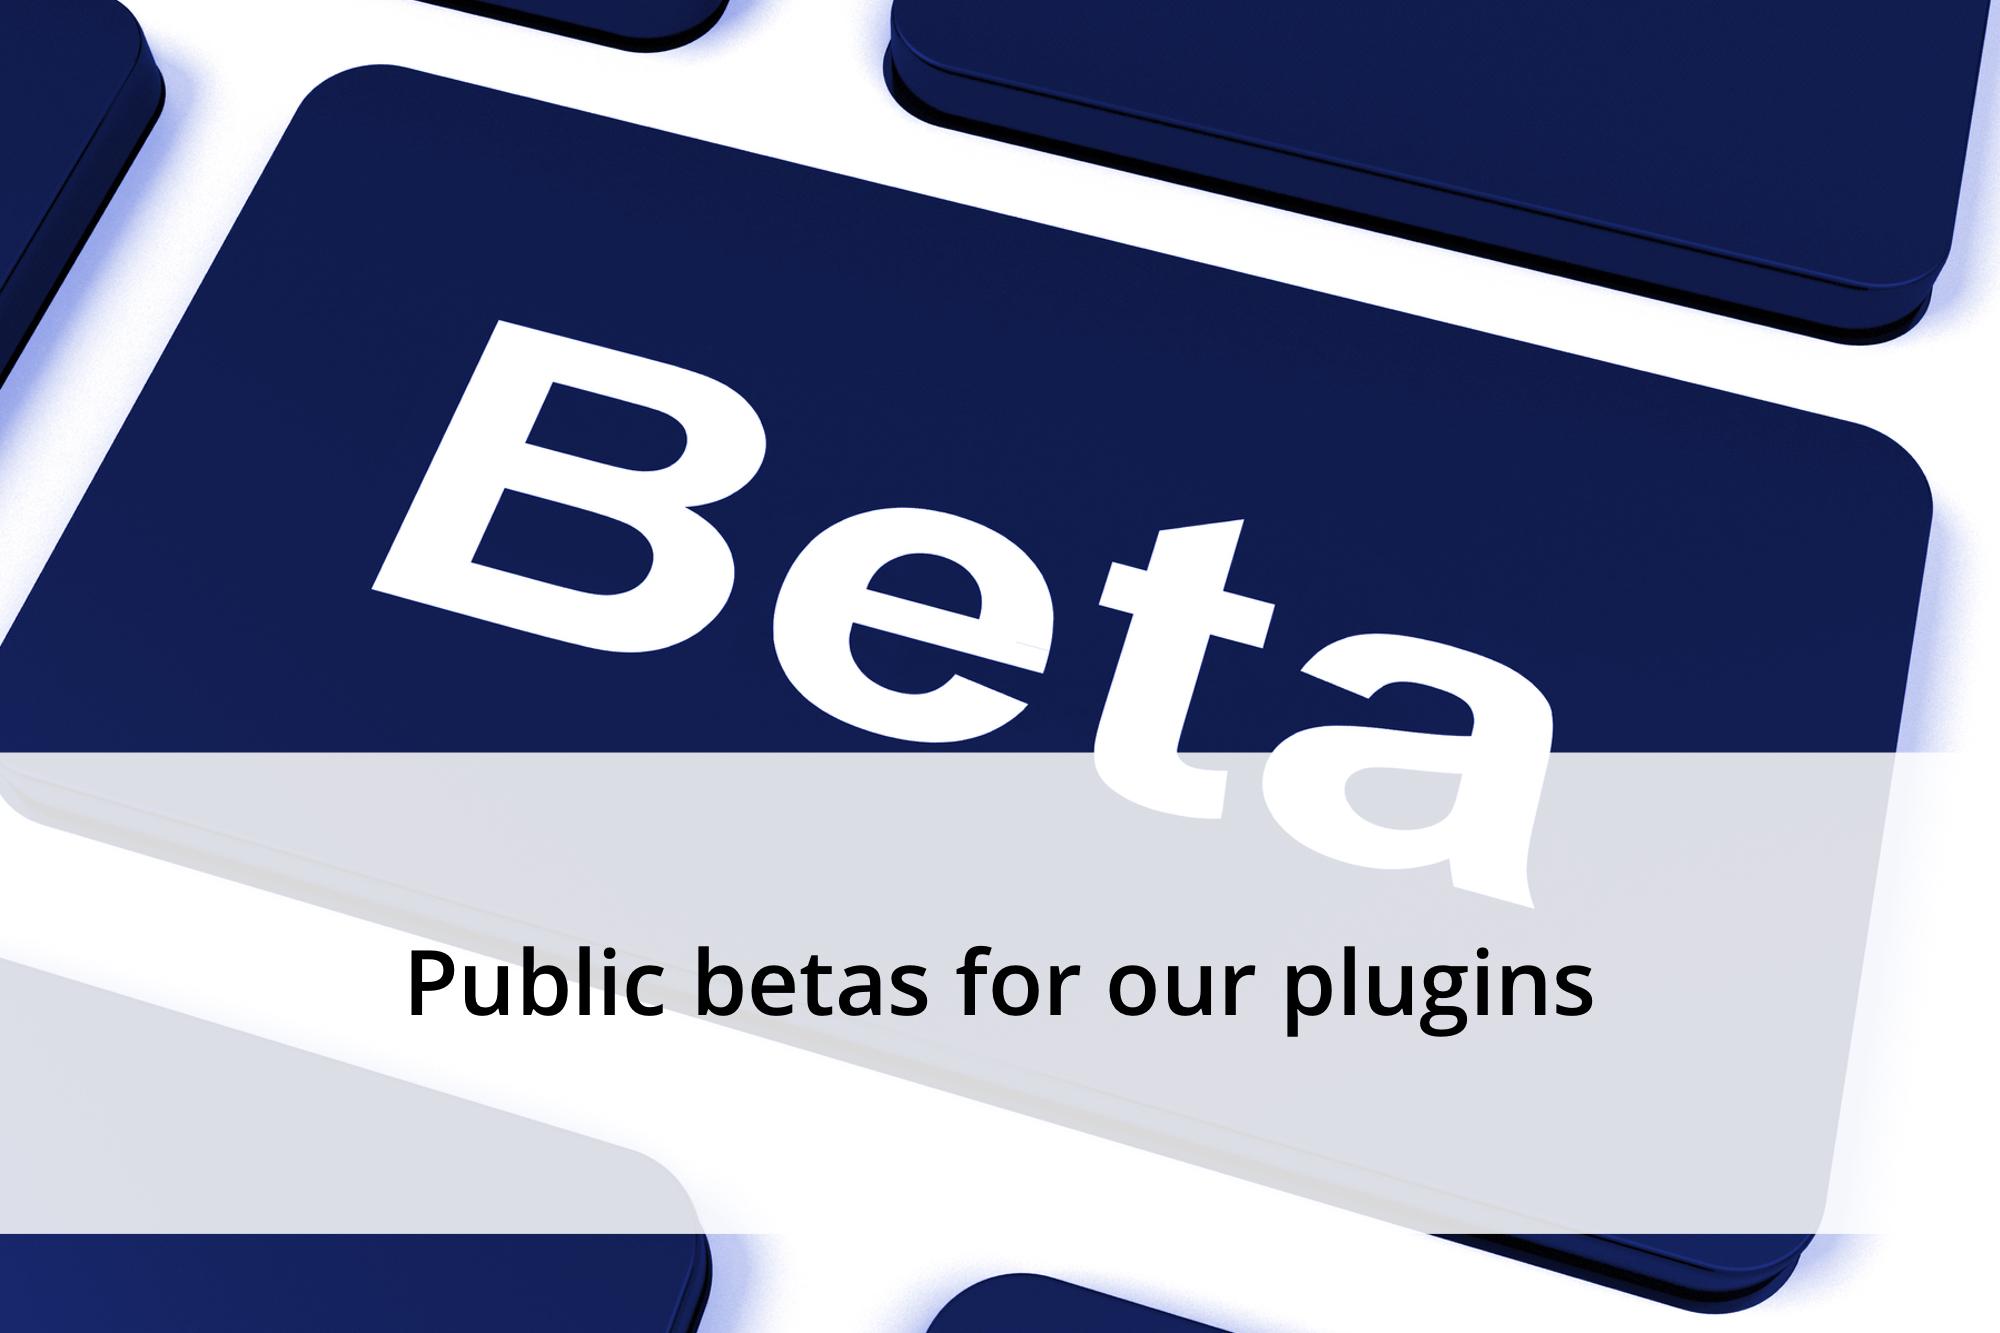 public betas for our plugins